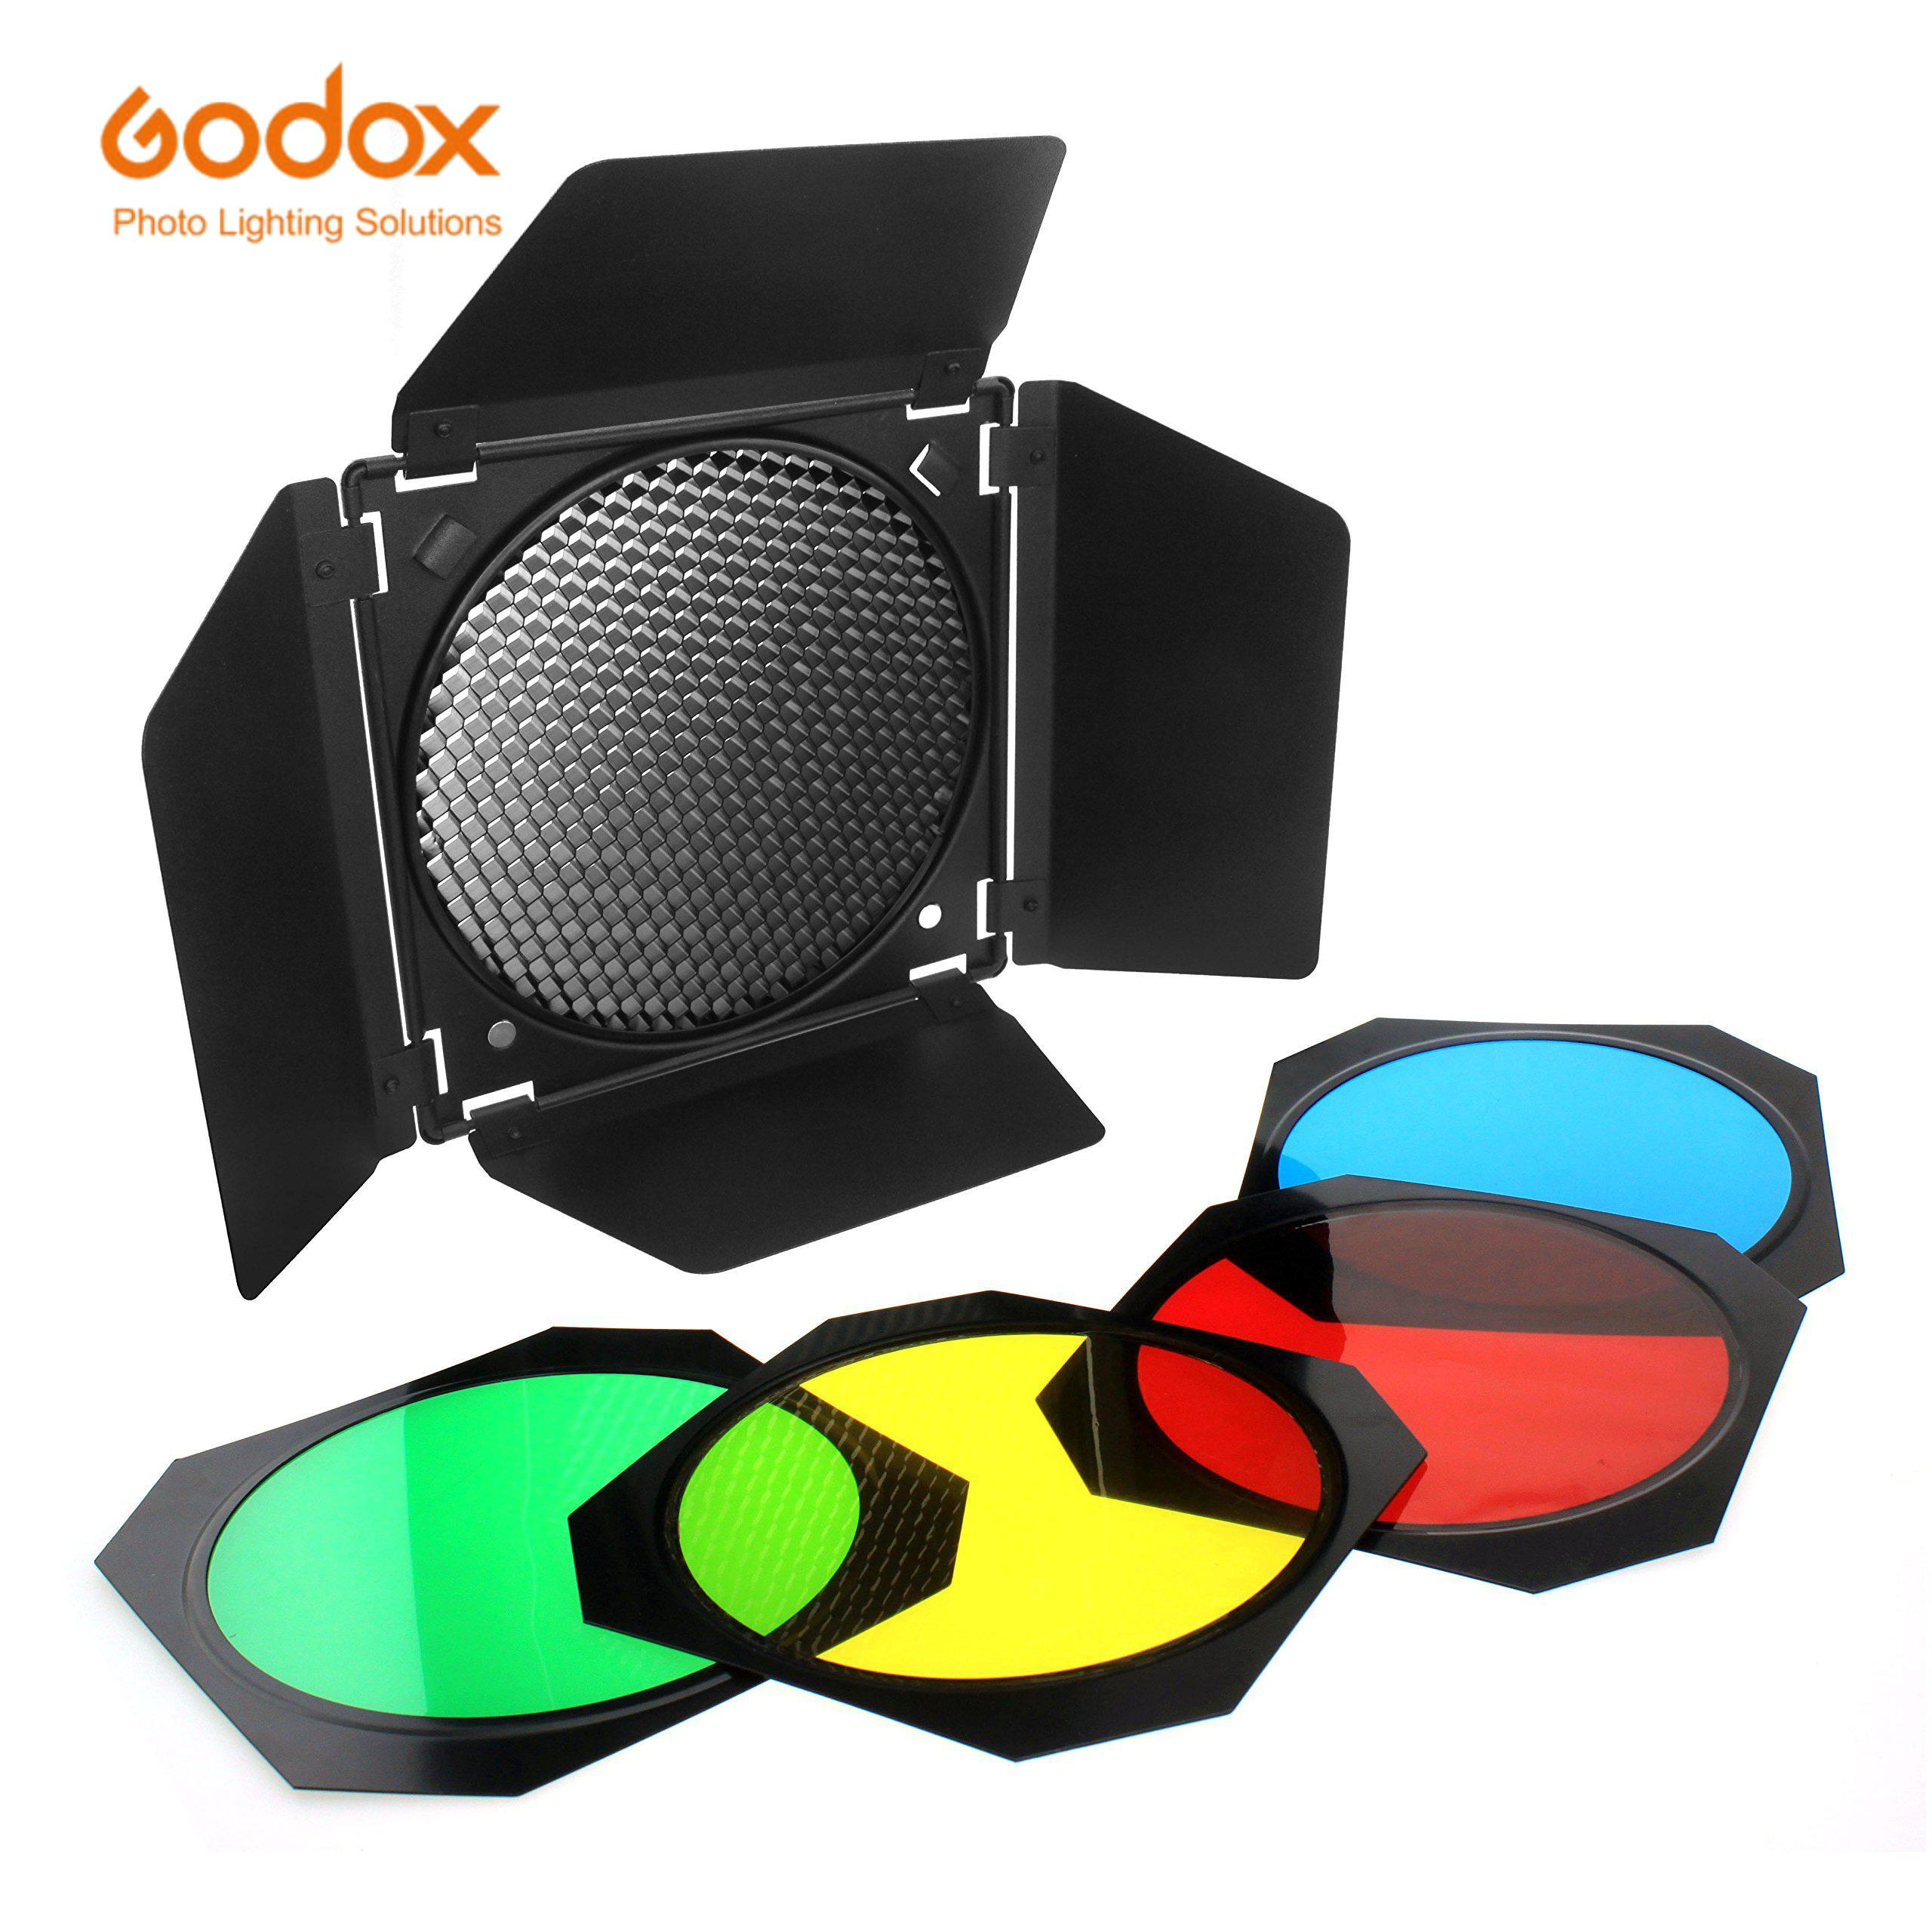 Godox BD-04 باب الحظيرة Barndoor العسل 4 اللون هلام مرشحات ل 7 بوصة معيار عاكس ل GODOX SL60W SL150II SK400II